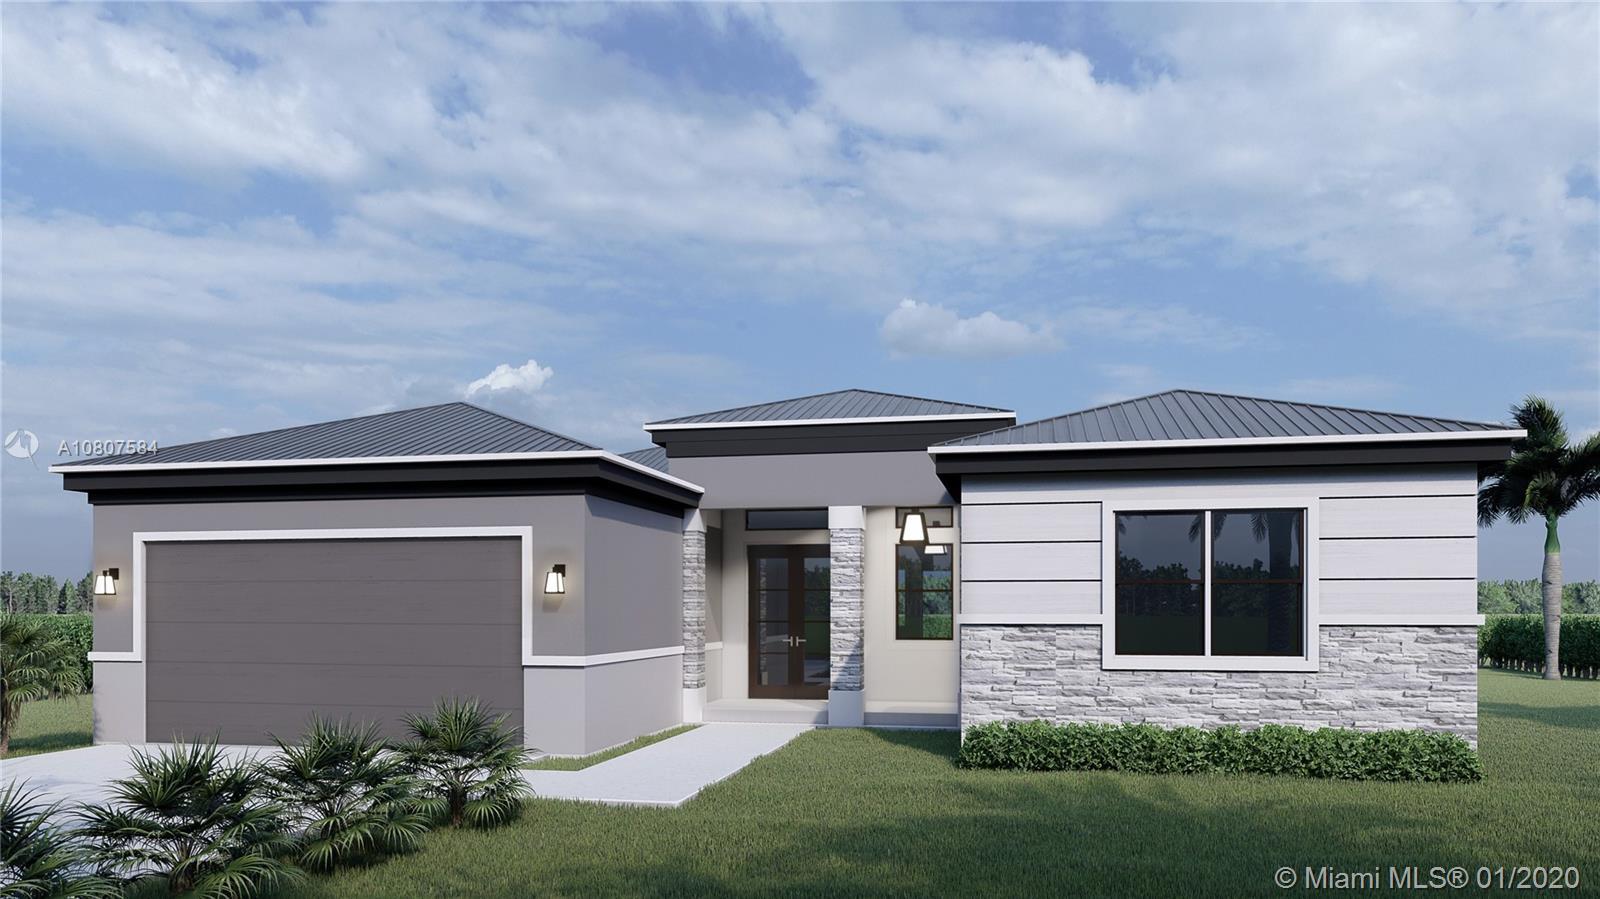 Gerardmere Acres Real Estate Listings Main Image